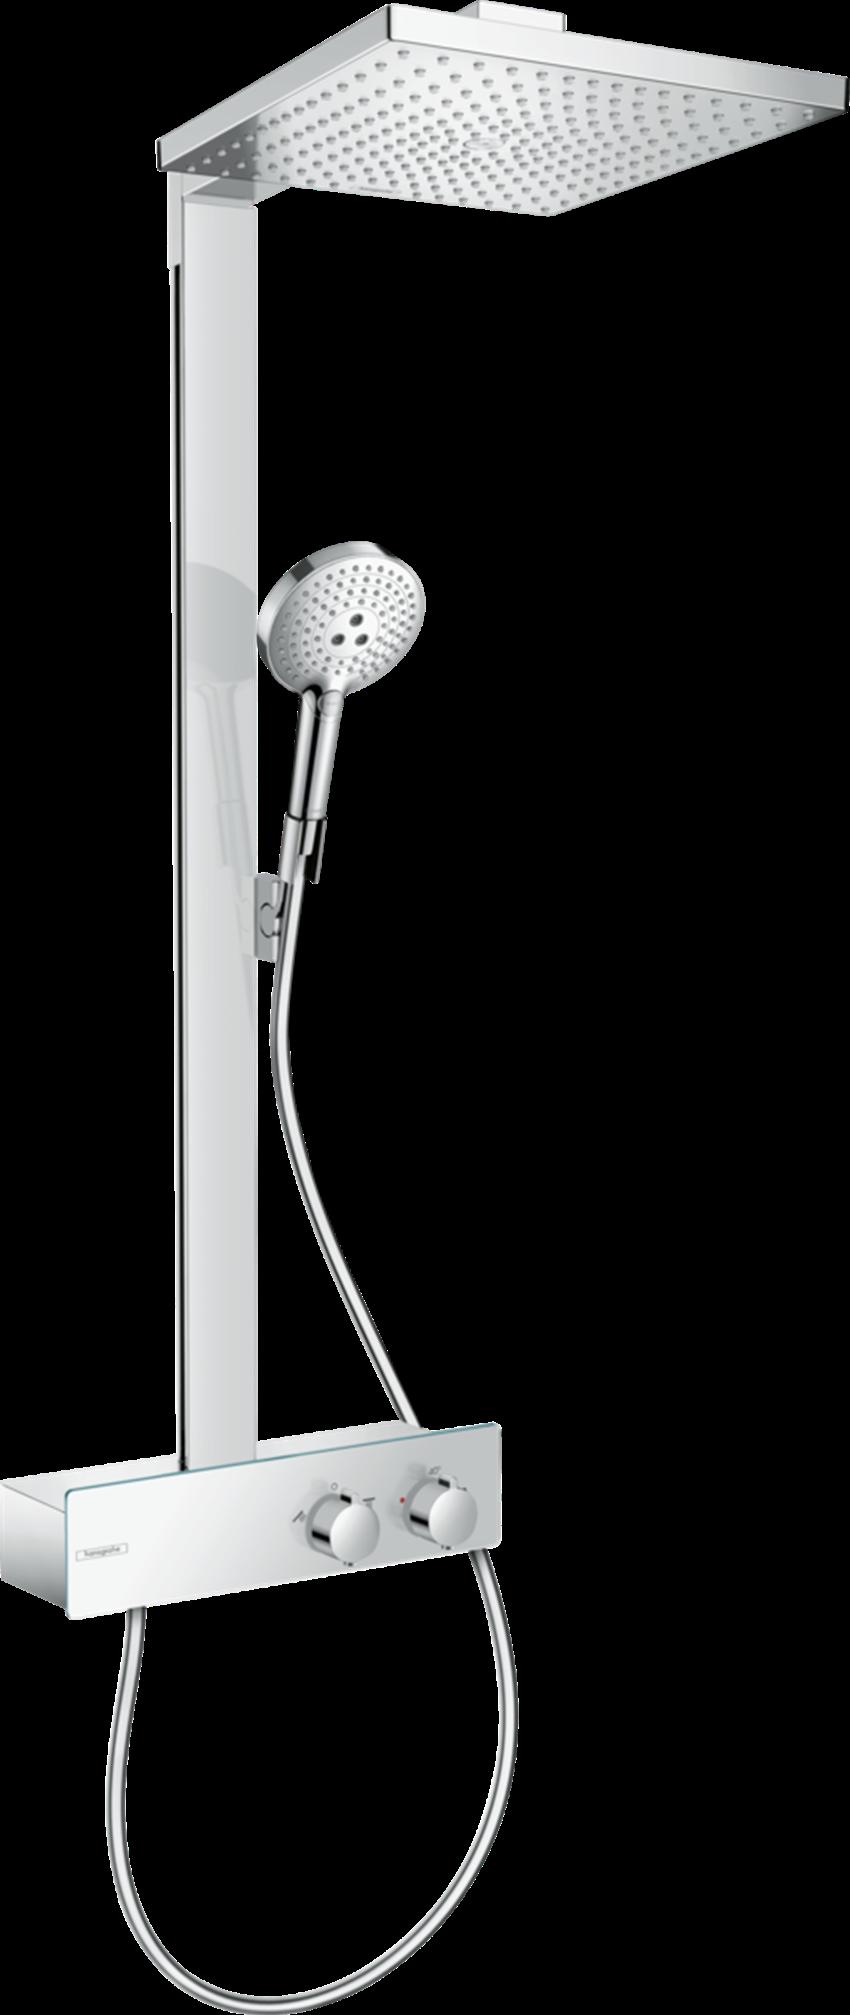 Komplet prysznicowy 300 1jet EcoSmart 9 l/min Hansgrohe Raindance E